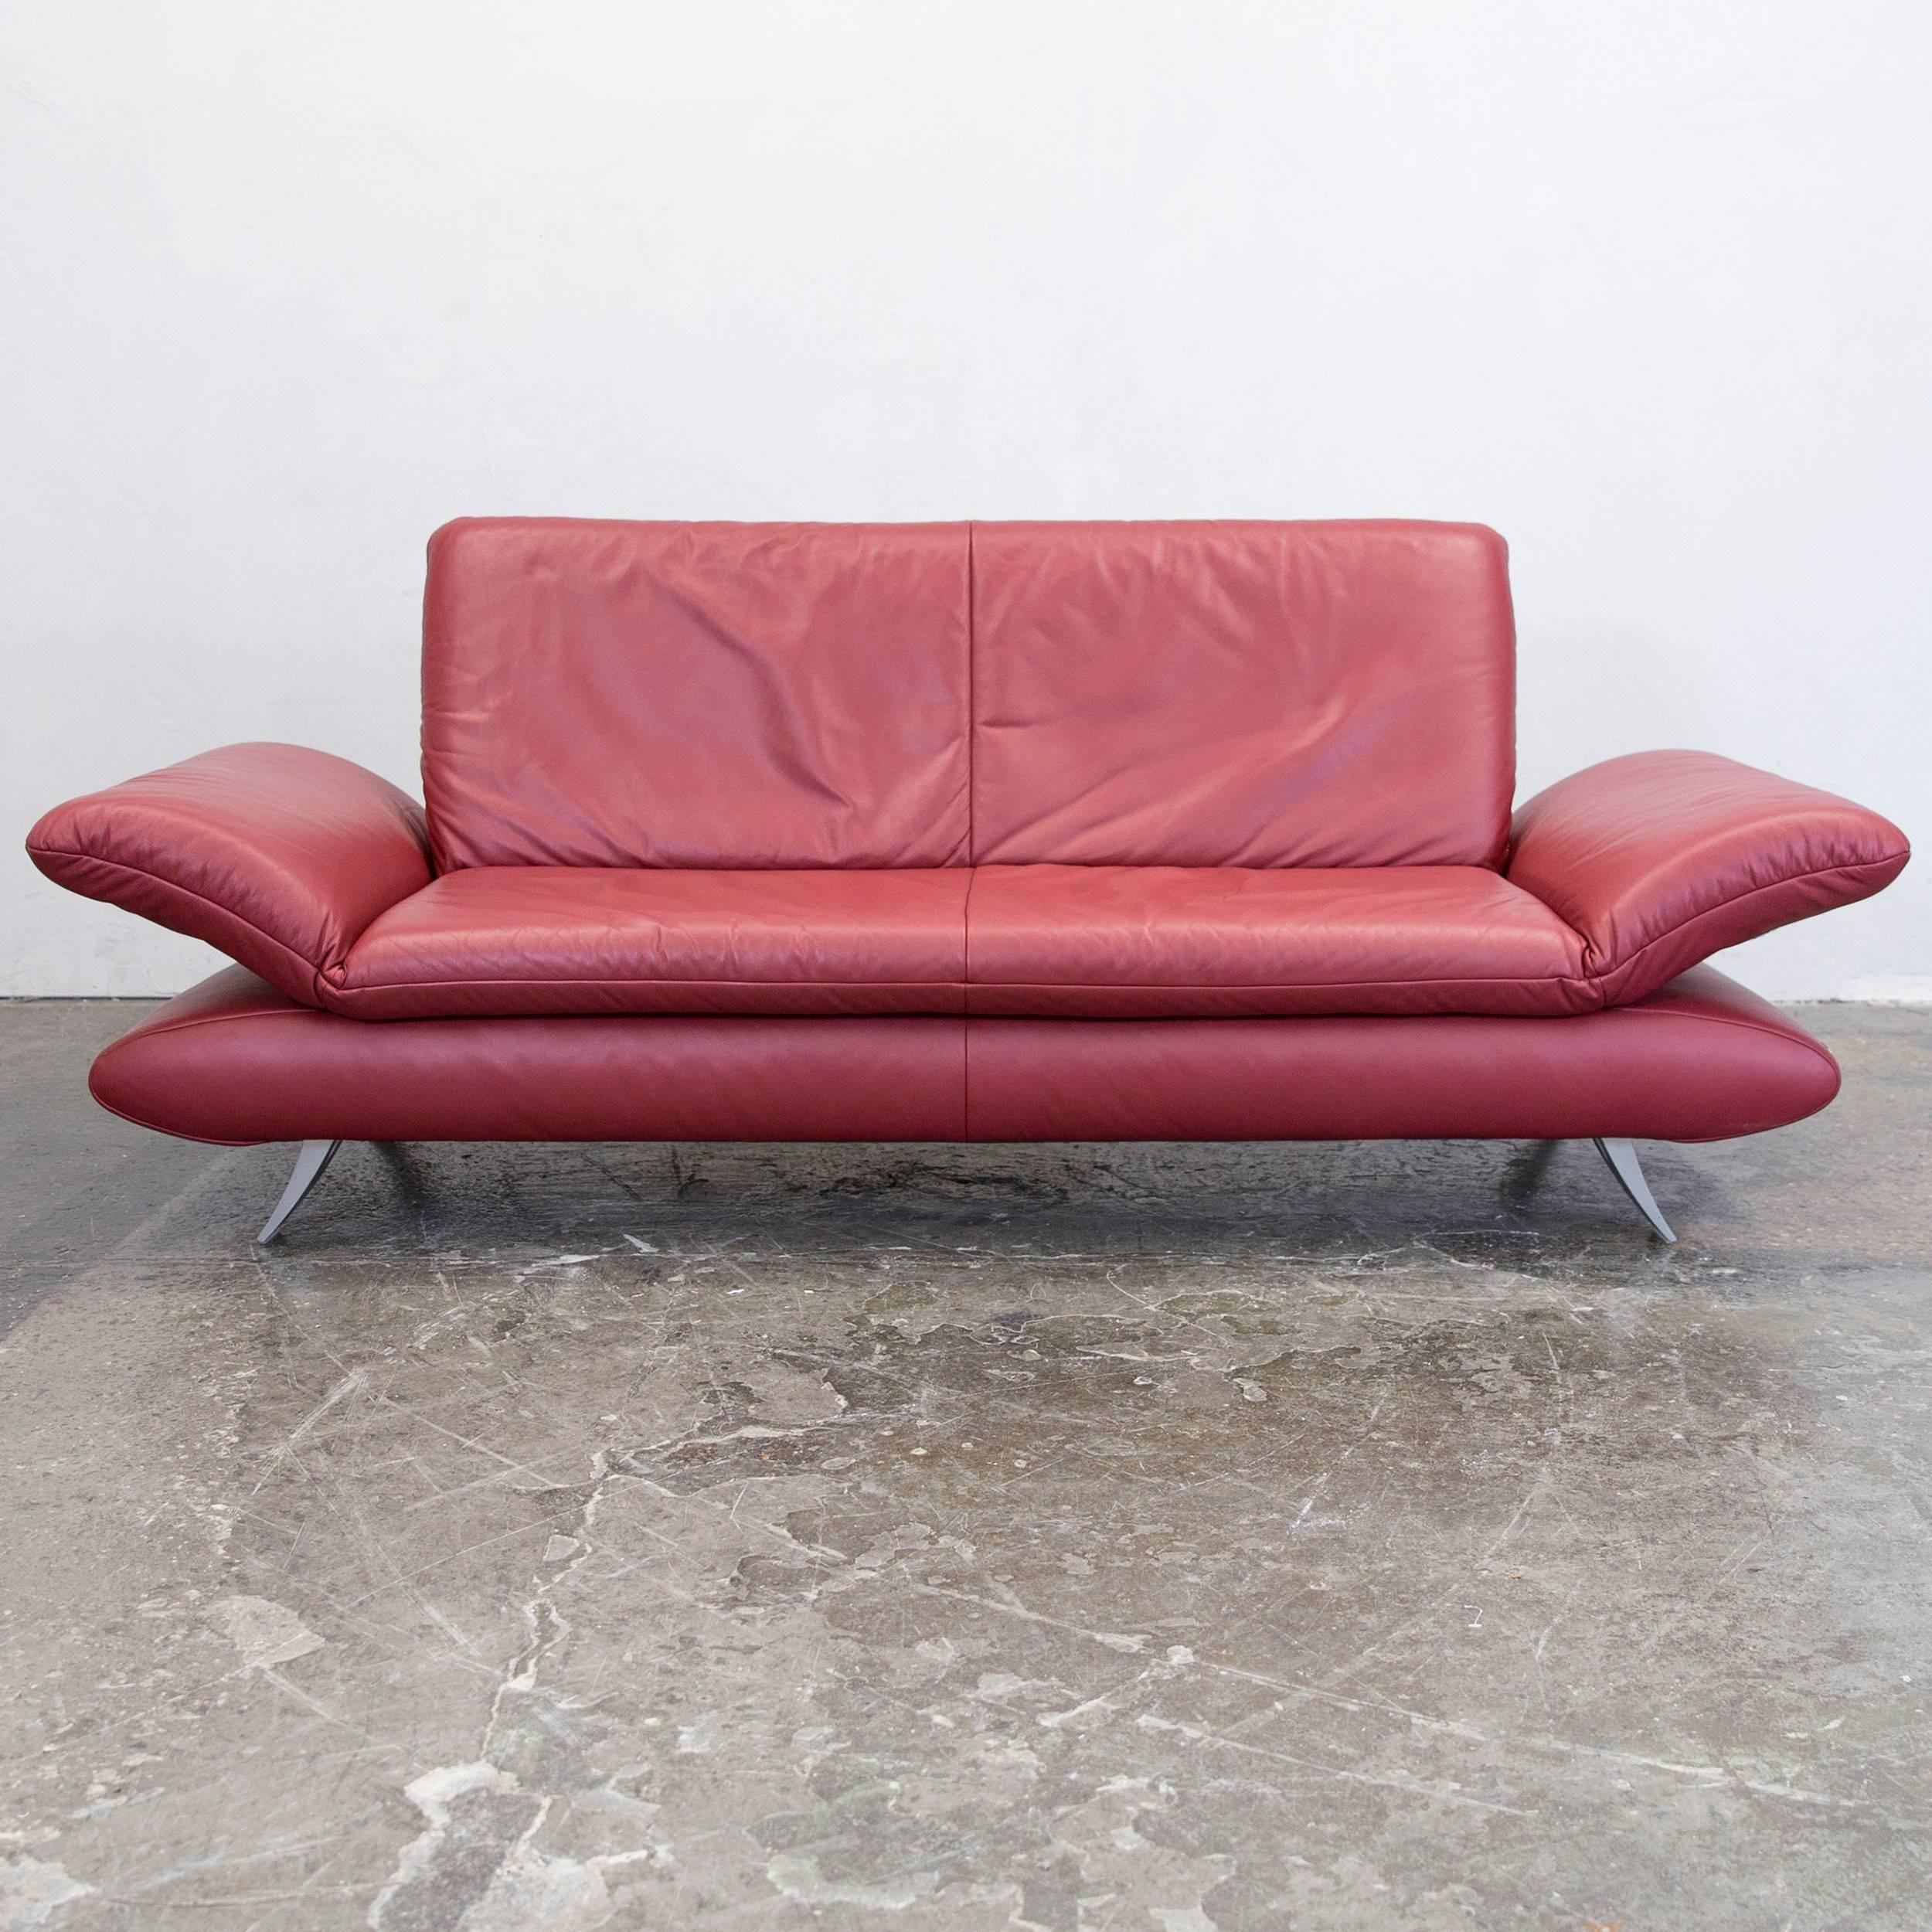 Elegant Koinor Rossini Designer Sofa Set Red Full Leather Three Seat Two Seat  Function Modern Idea